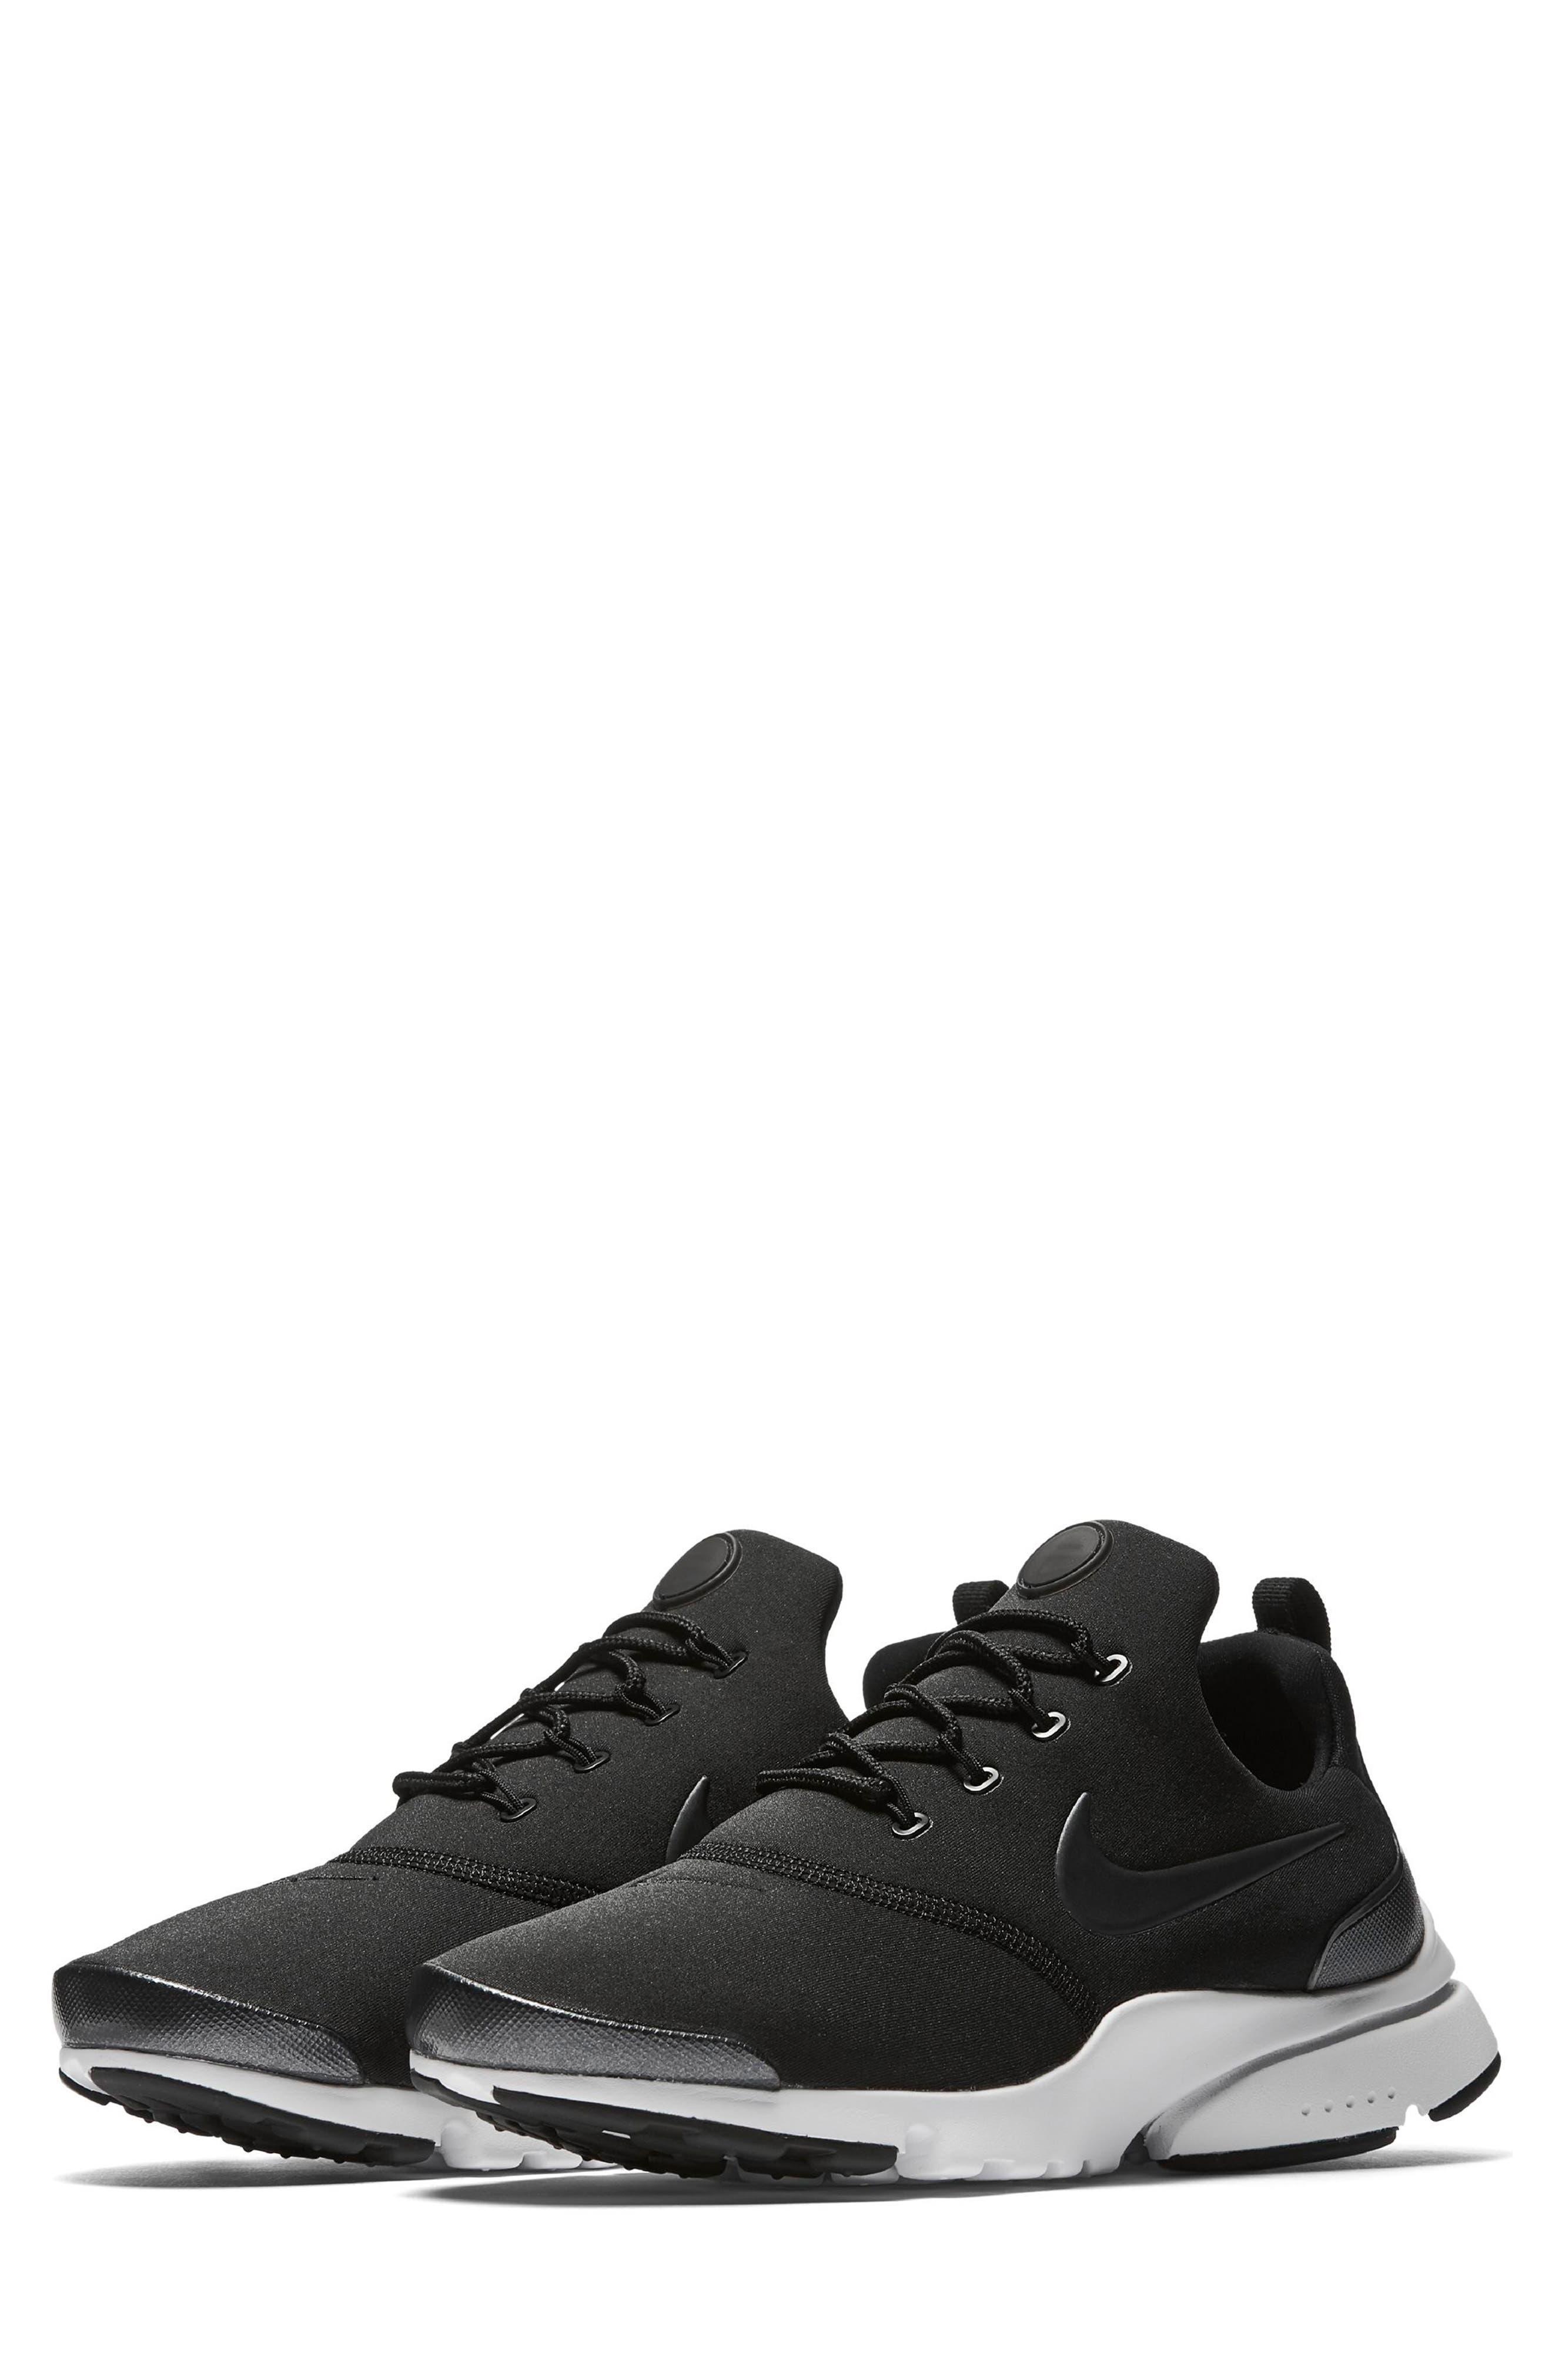 Presto Ultra SE Sneaker,                             Main thumbnail 1, color,                             Black/ Grey/ White